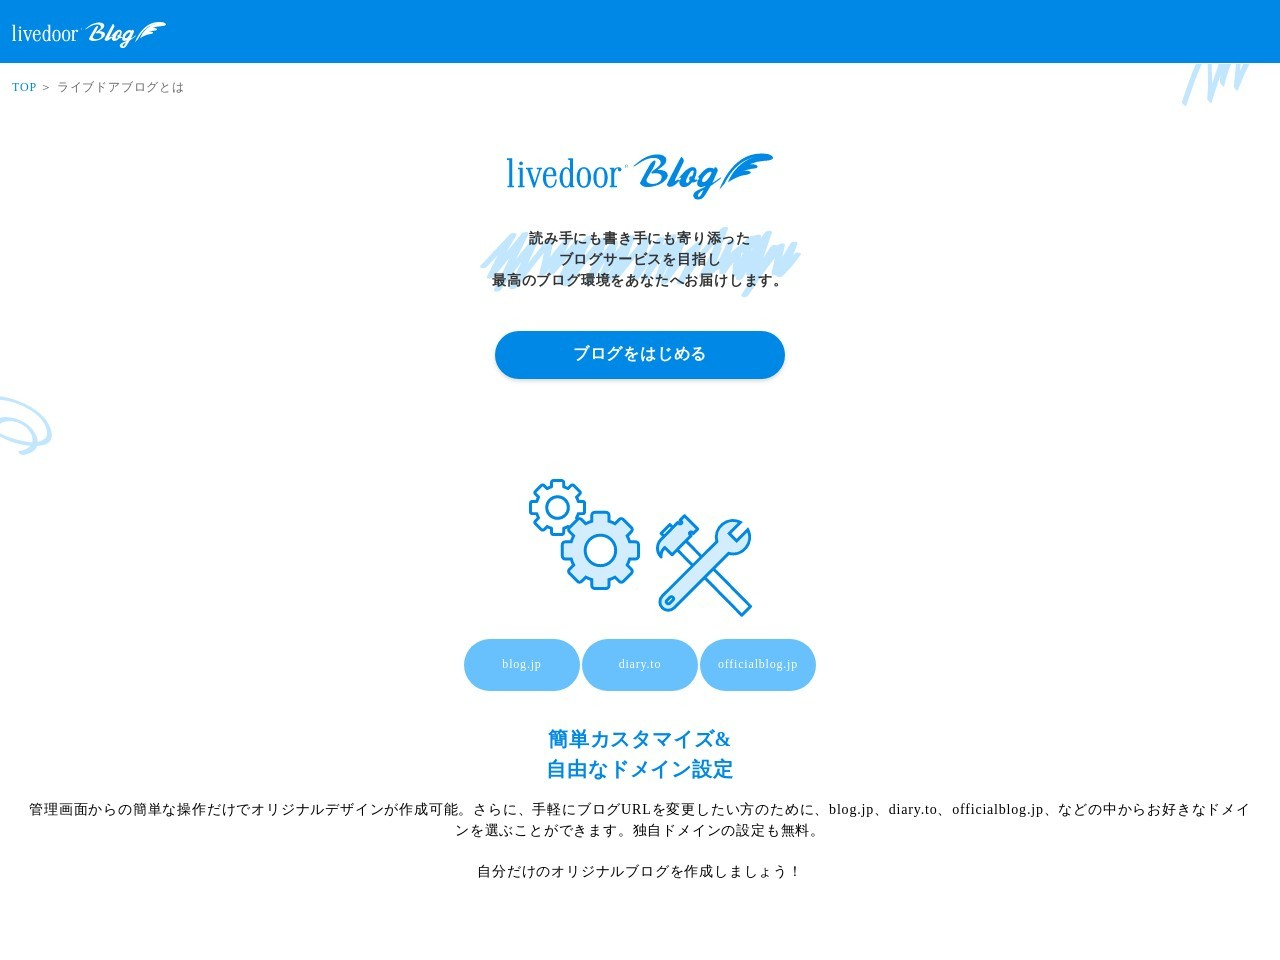 http://blog.livedoor.jp/hirogaloppa10000/